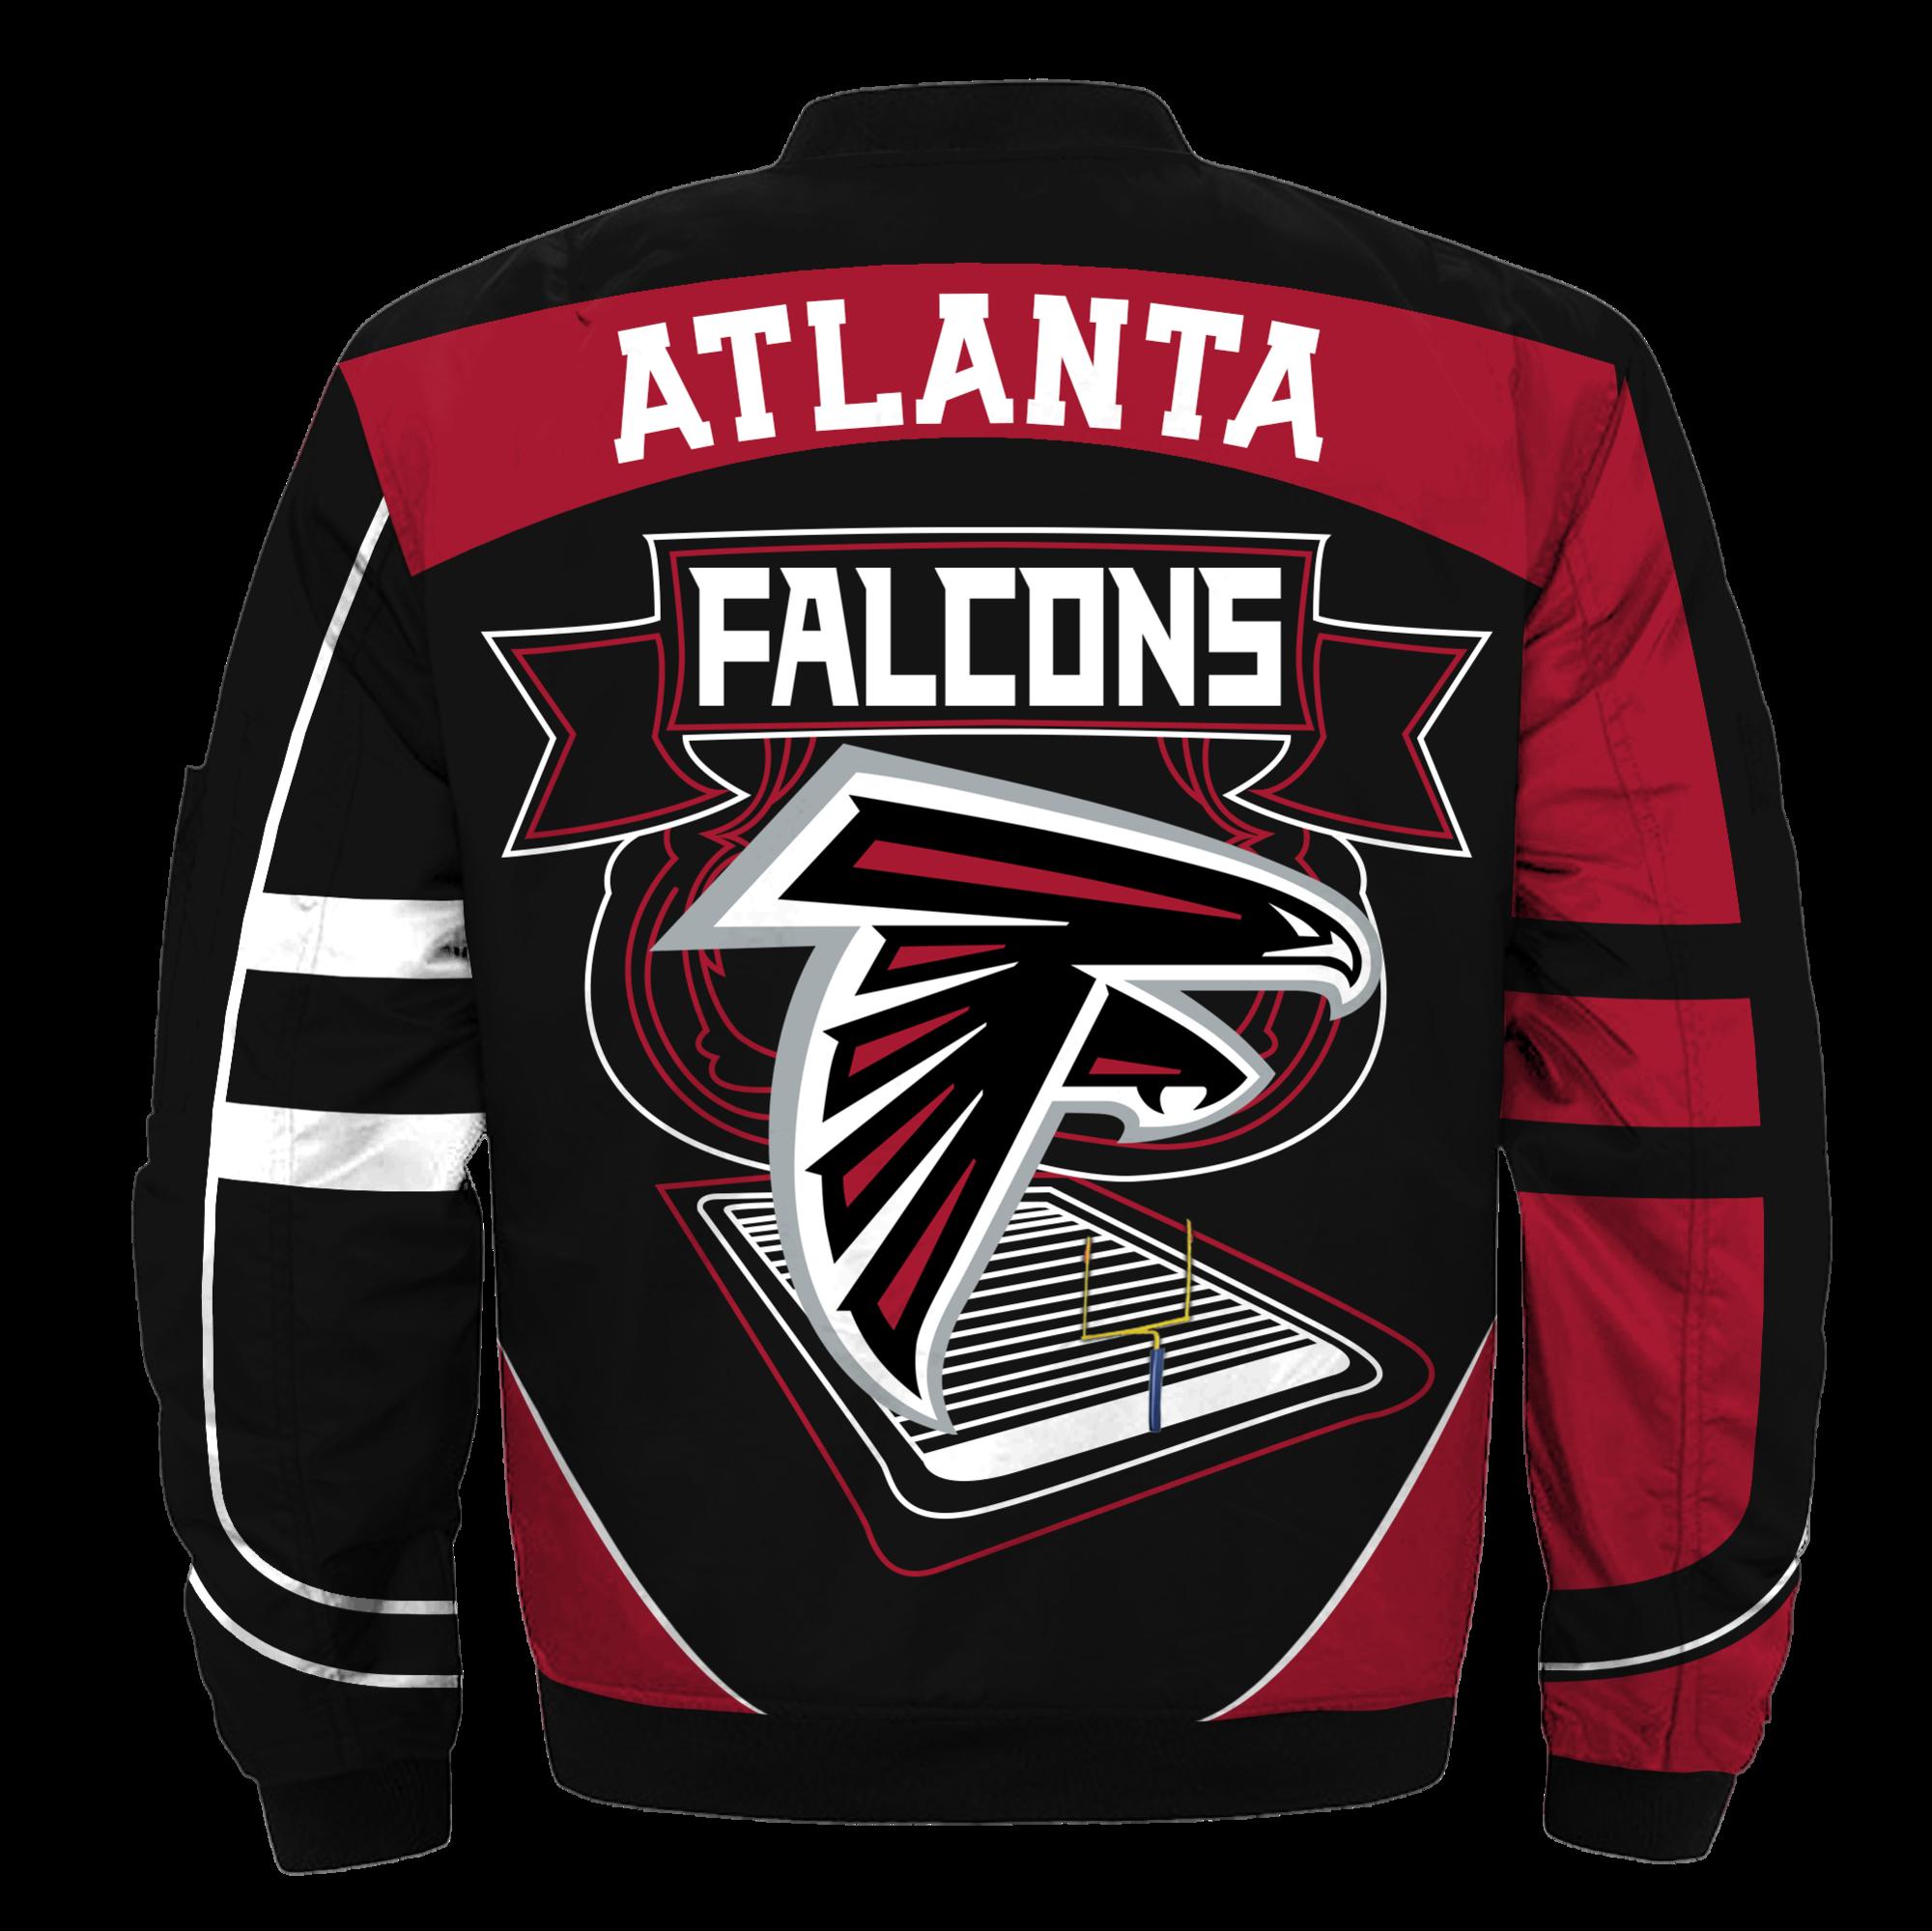 Atlanta Falcons Bomber Jacket Nfl Atlanta Falcons Apparel Nfl Futbol Americano Americana